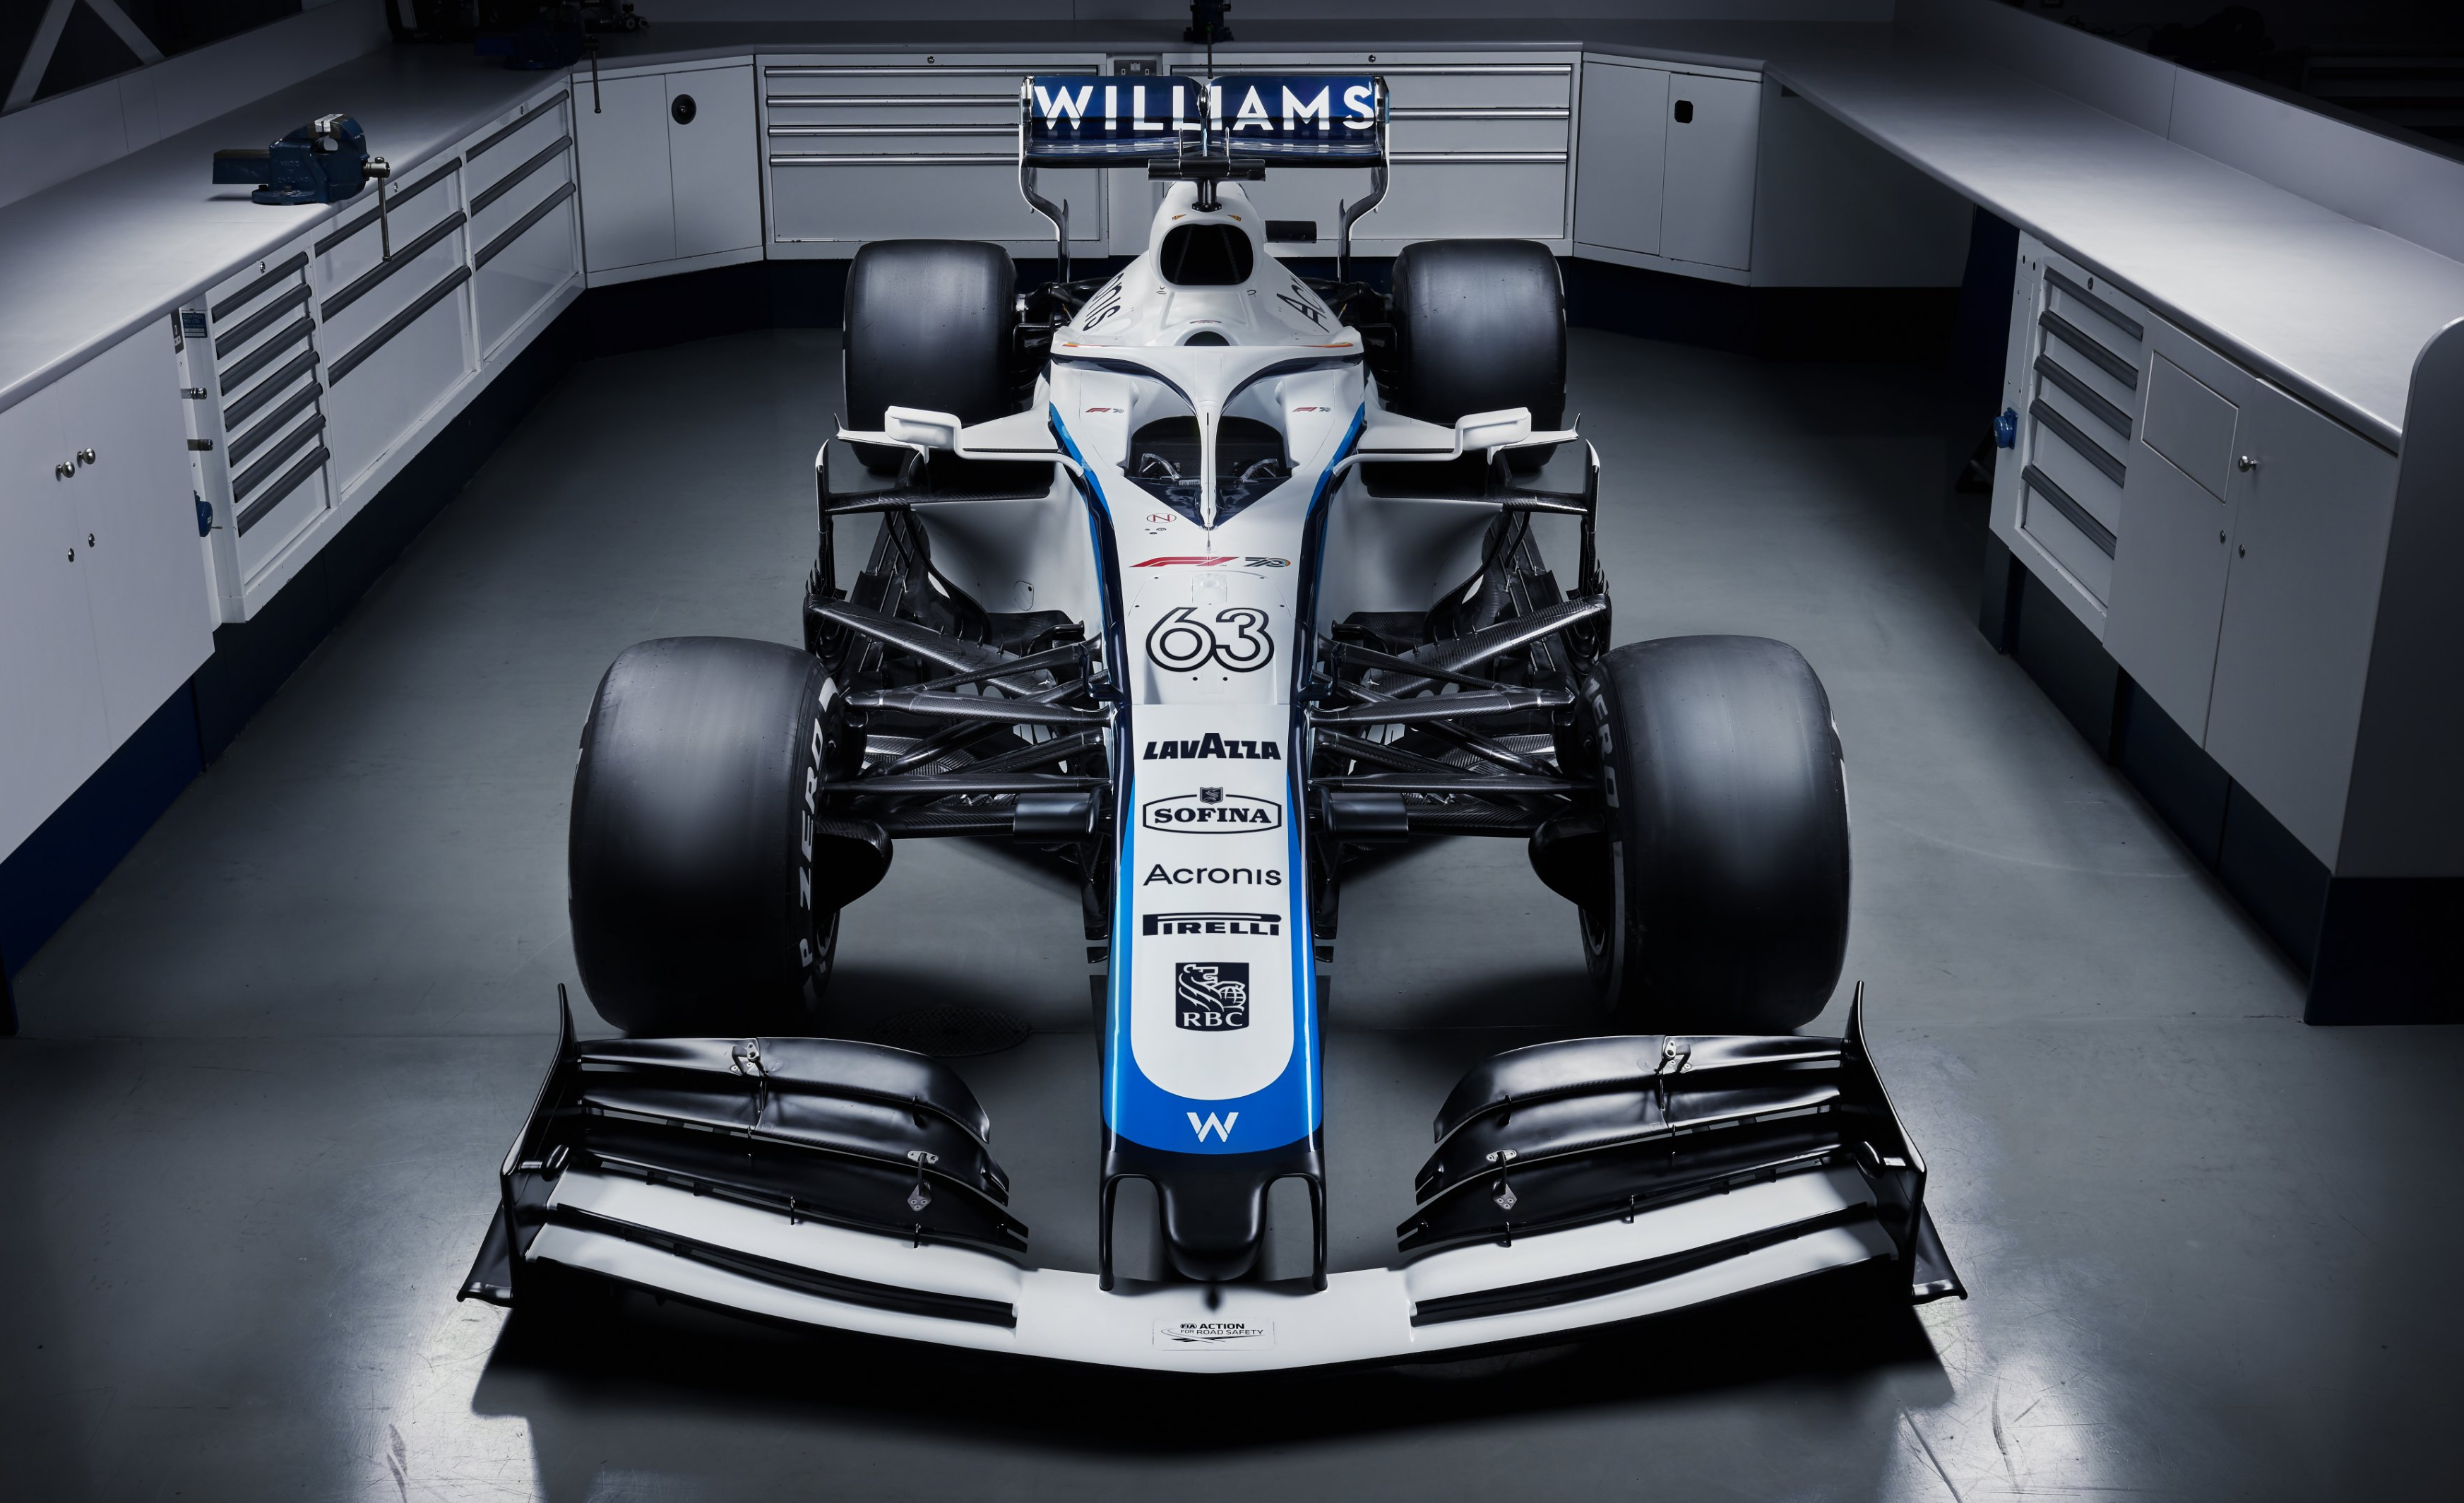 willams 01